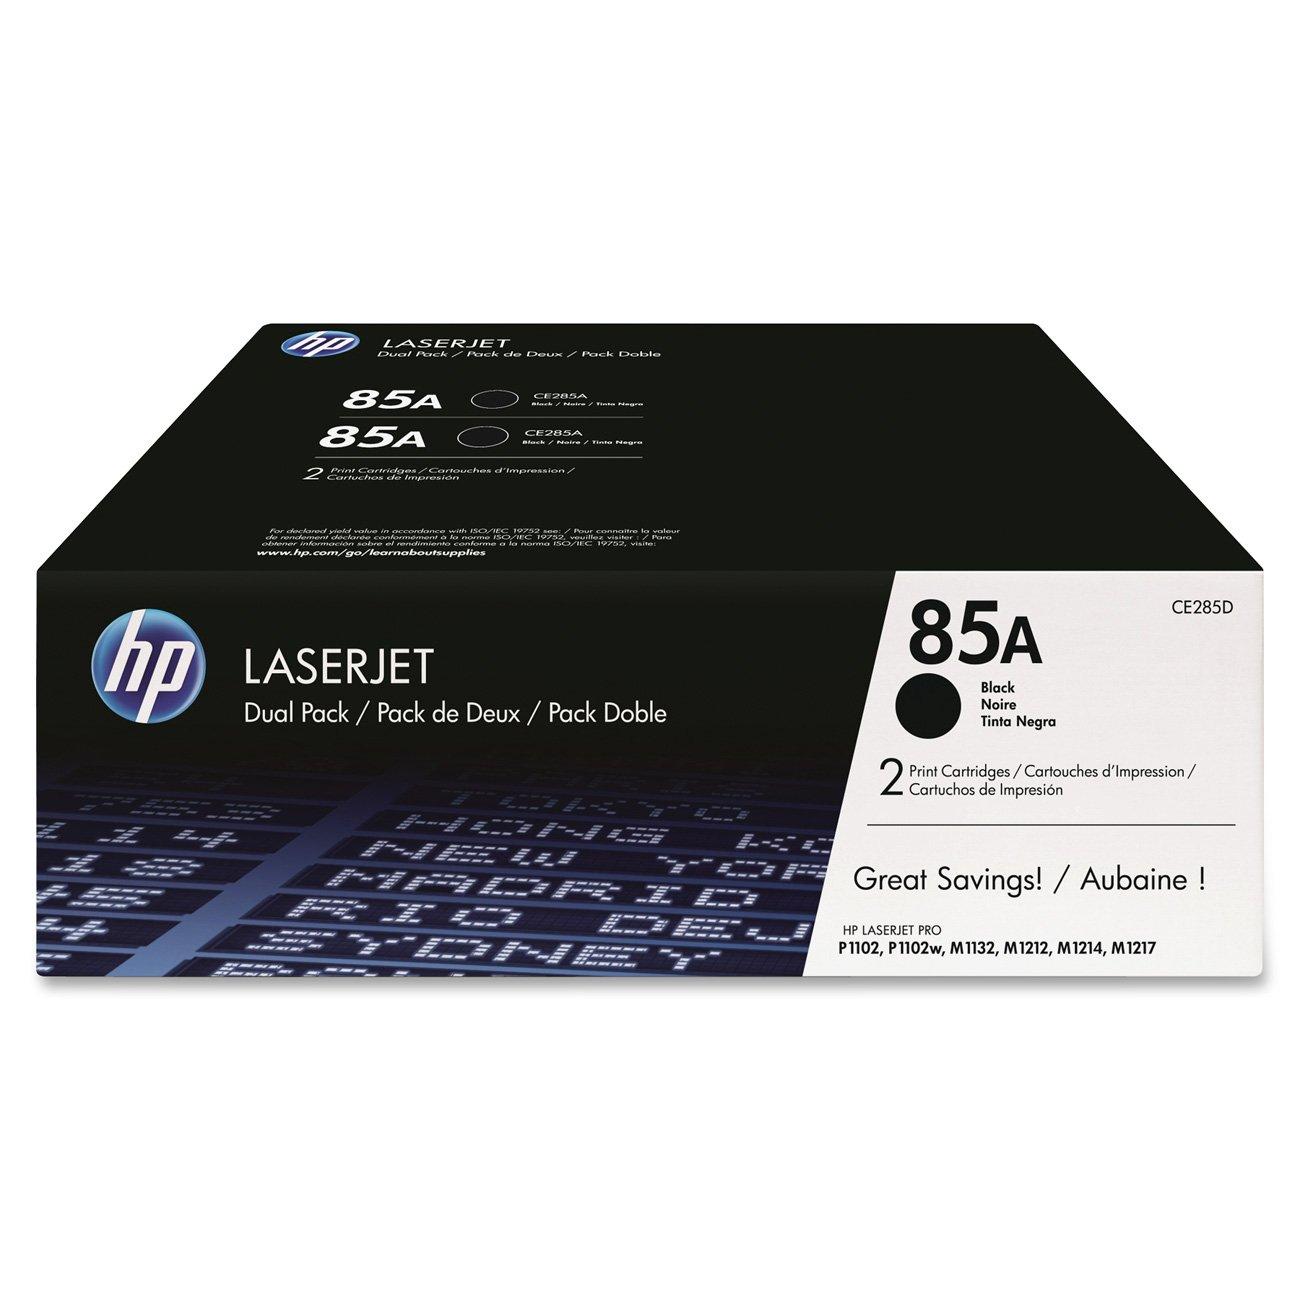 HP 85A (CE285A) Black Toner Cartridge, 2 Toner Cartridges for HP LaserJet Pro M1212nf, M1217nfw, P1102w